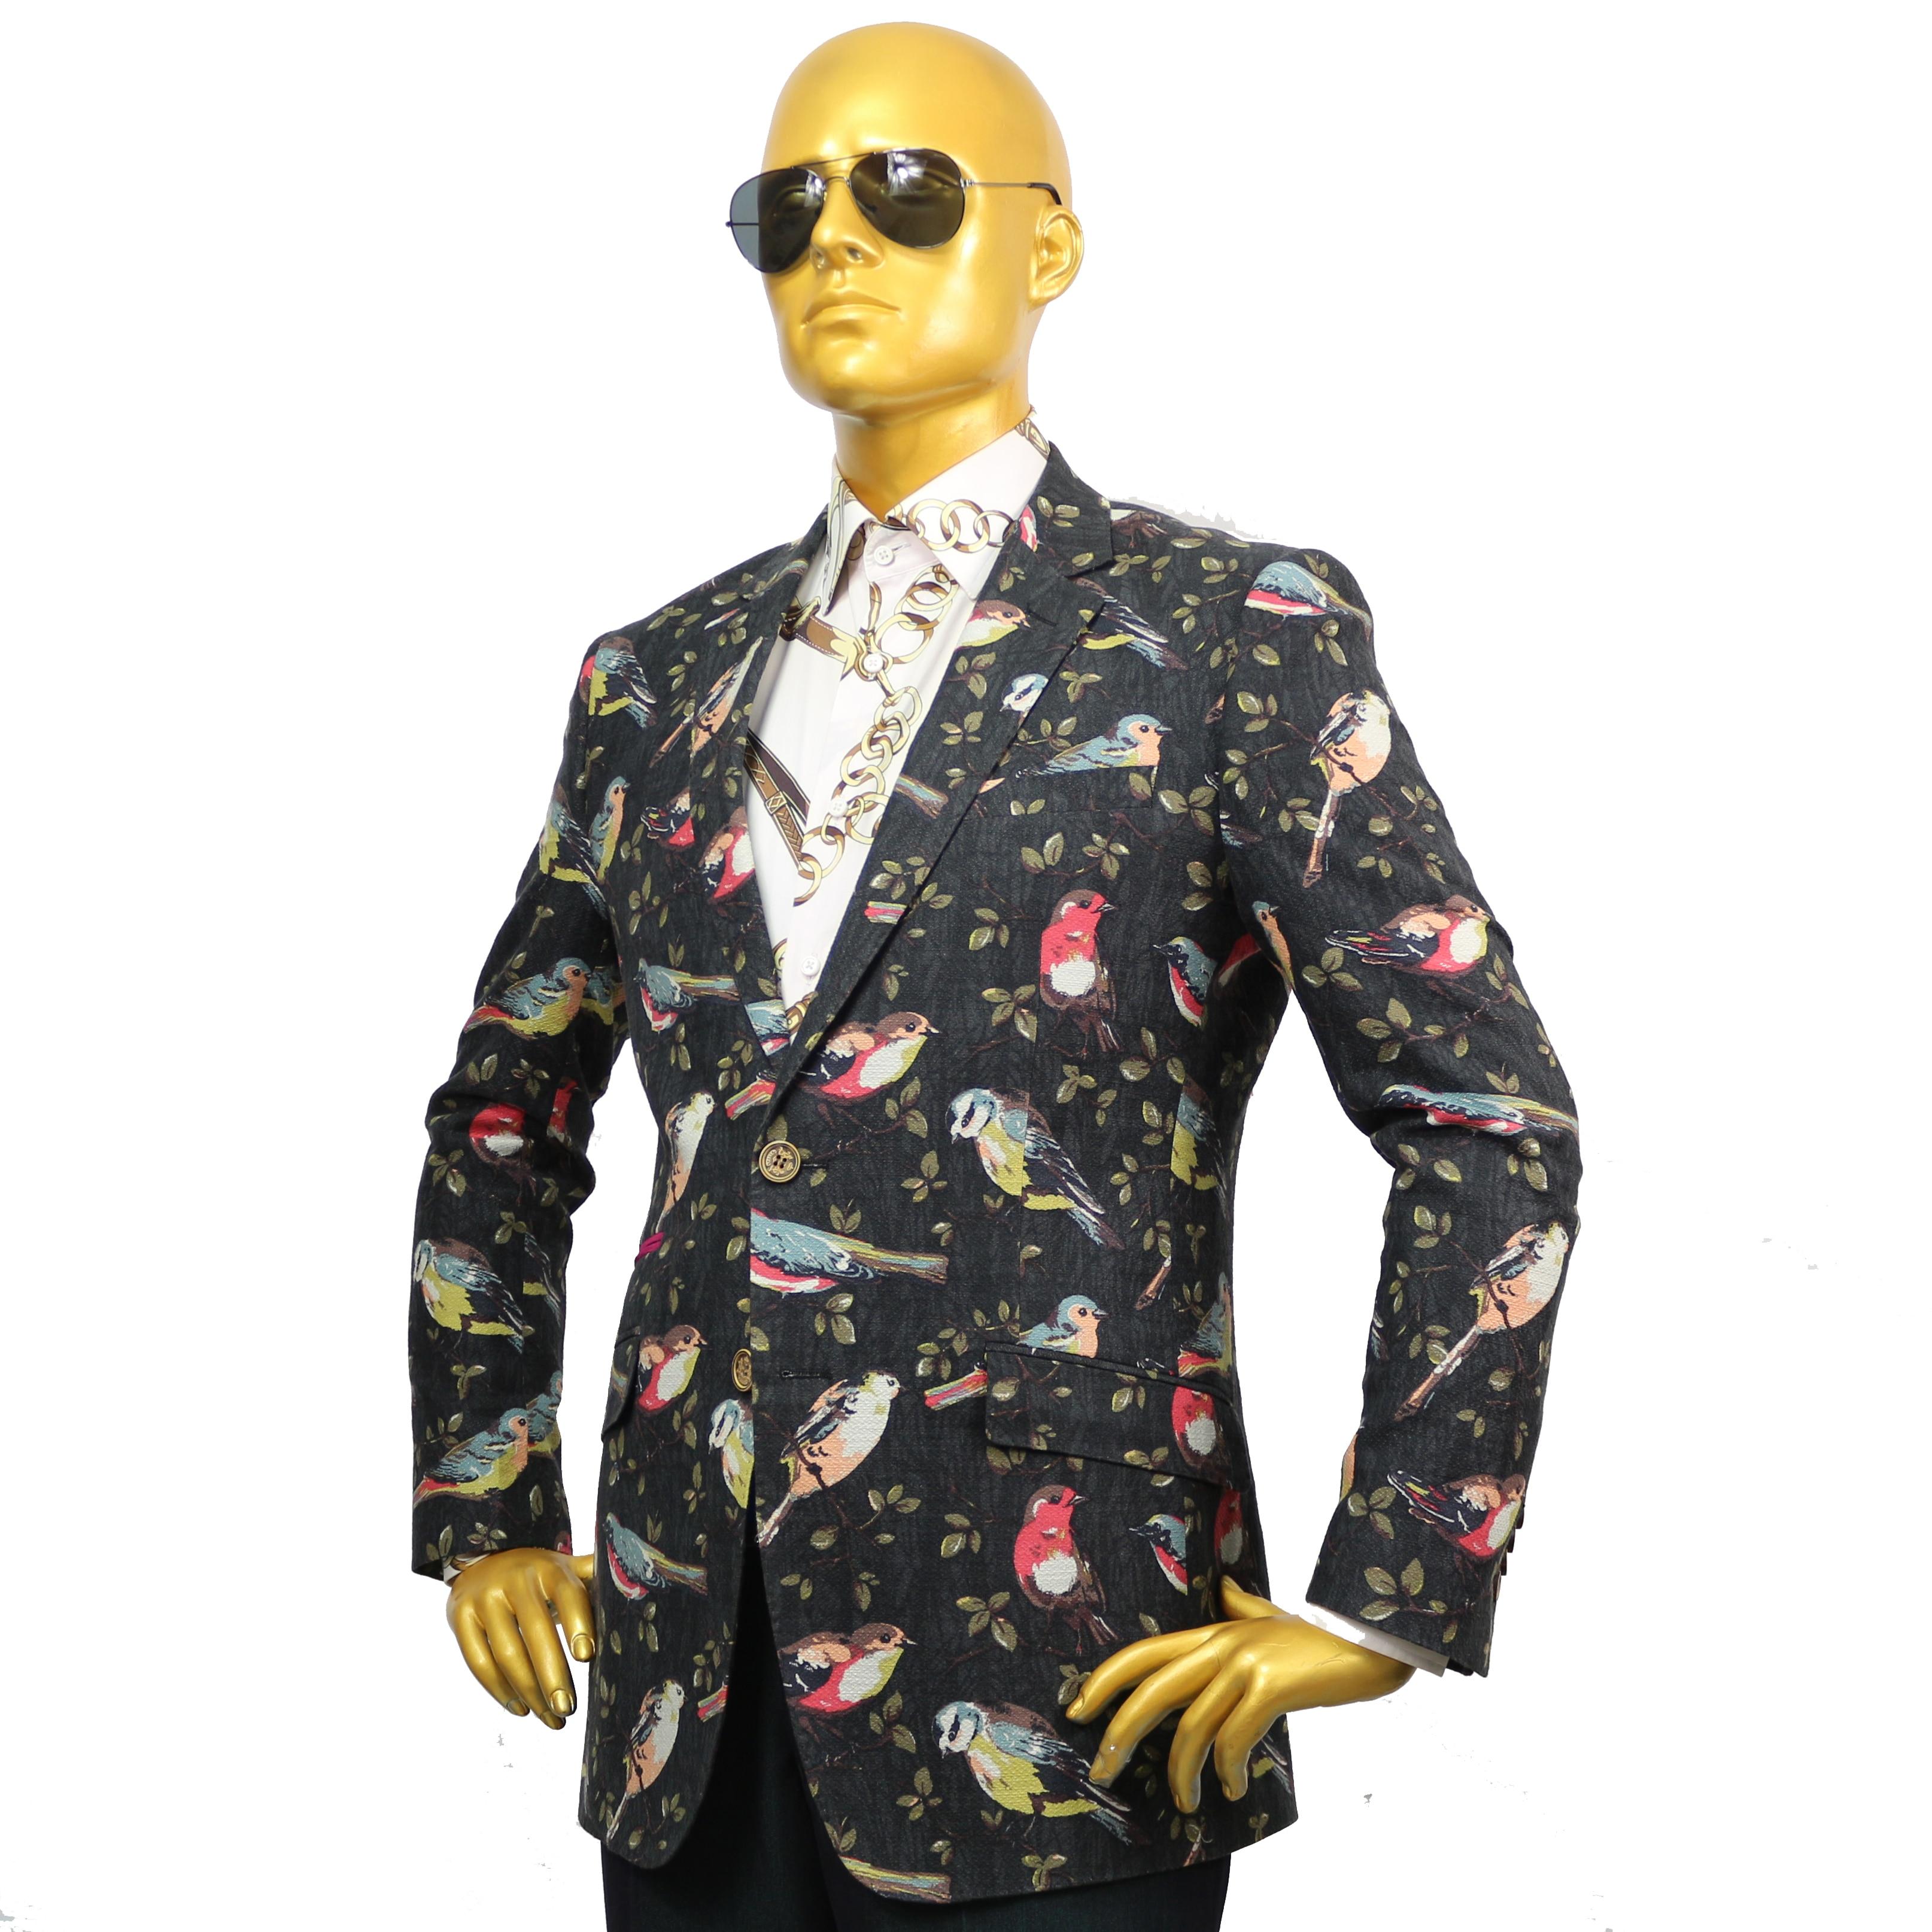 Custom Tailor Made Men S Bespoke Suits Business Designer Wedding Bespoke 2 Piece Suit Jacket Pants  Bird Floral Cotton Slim 20